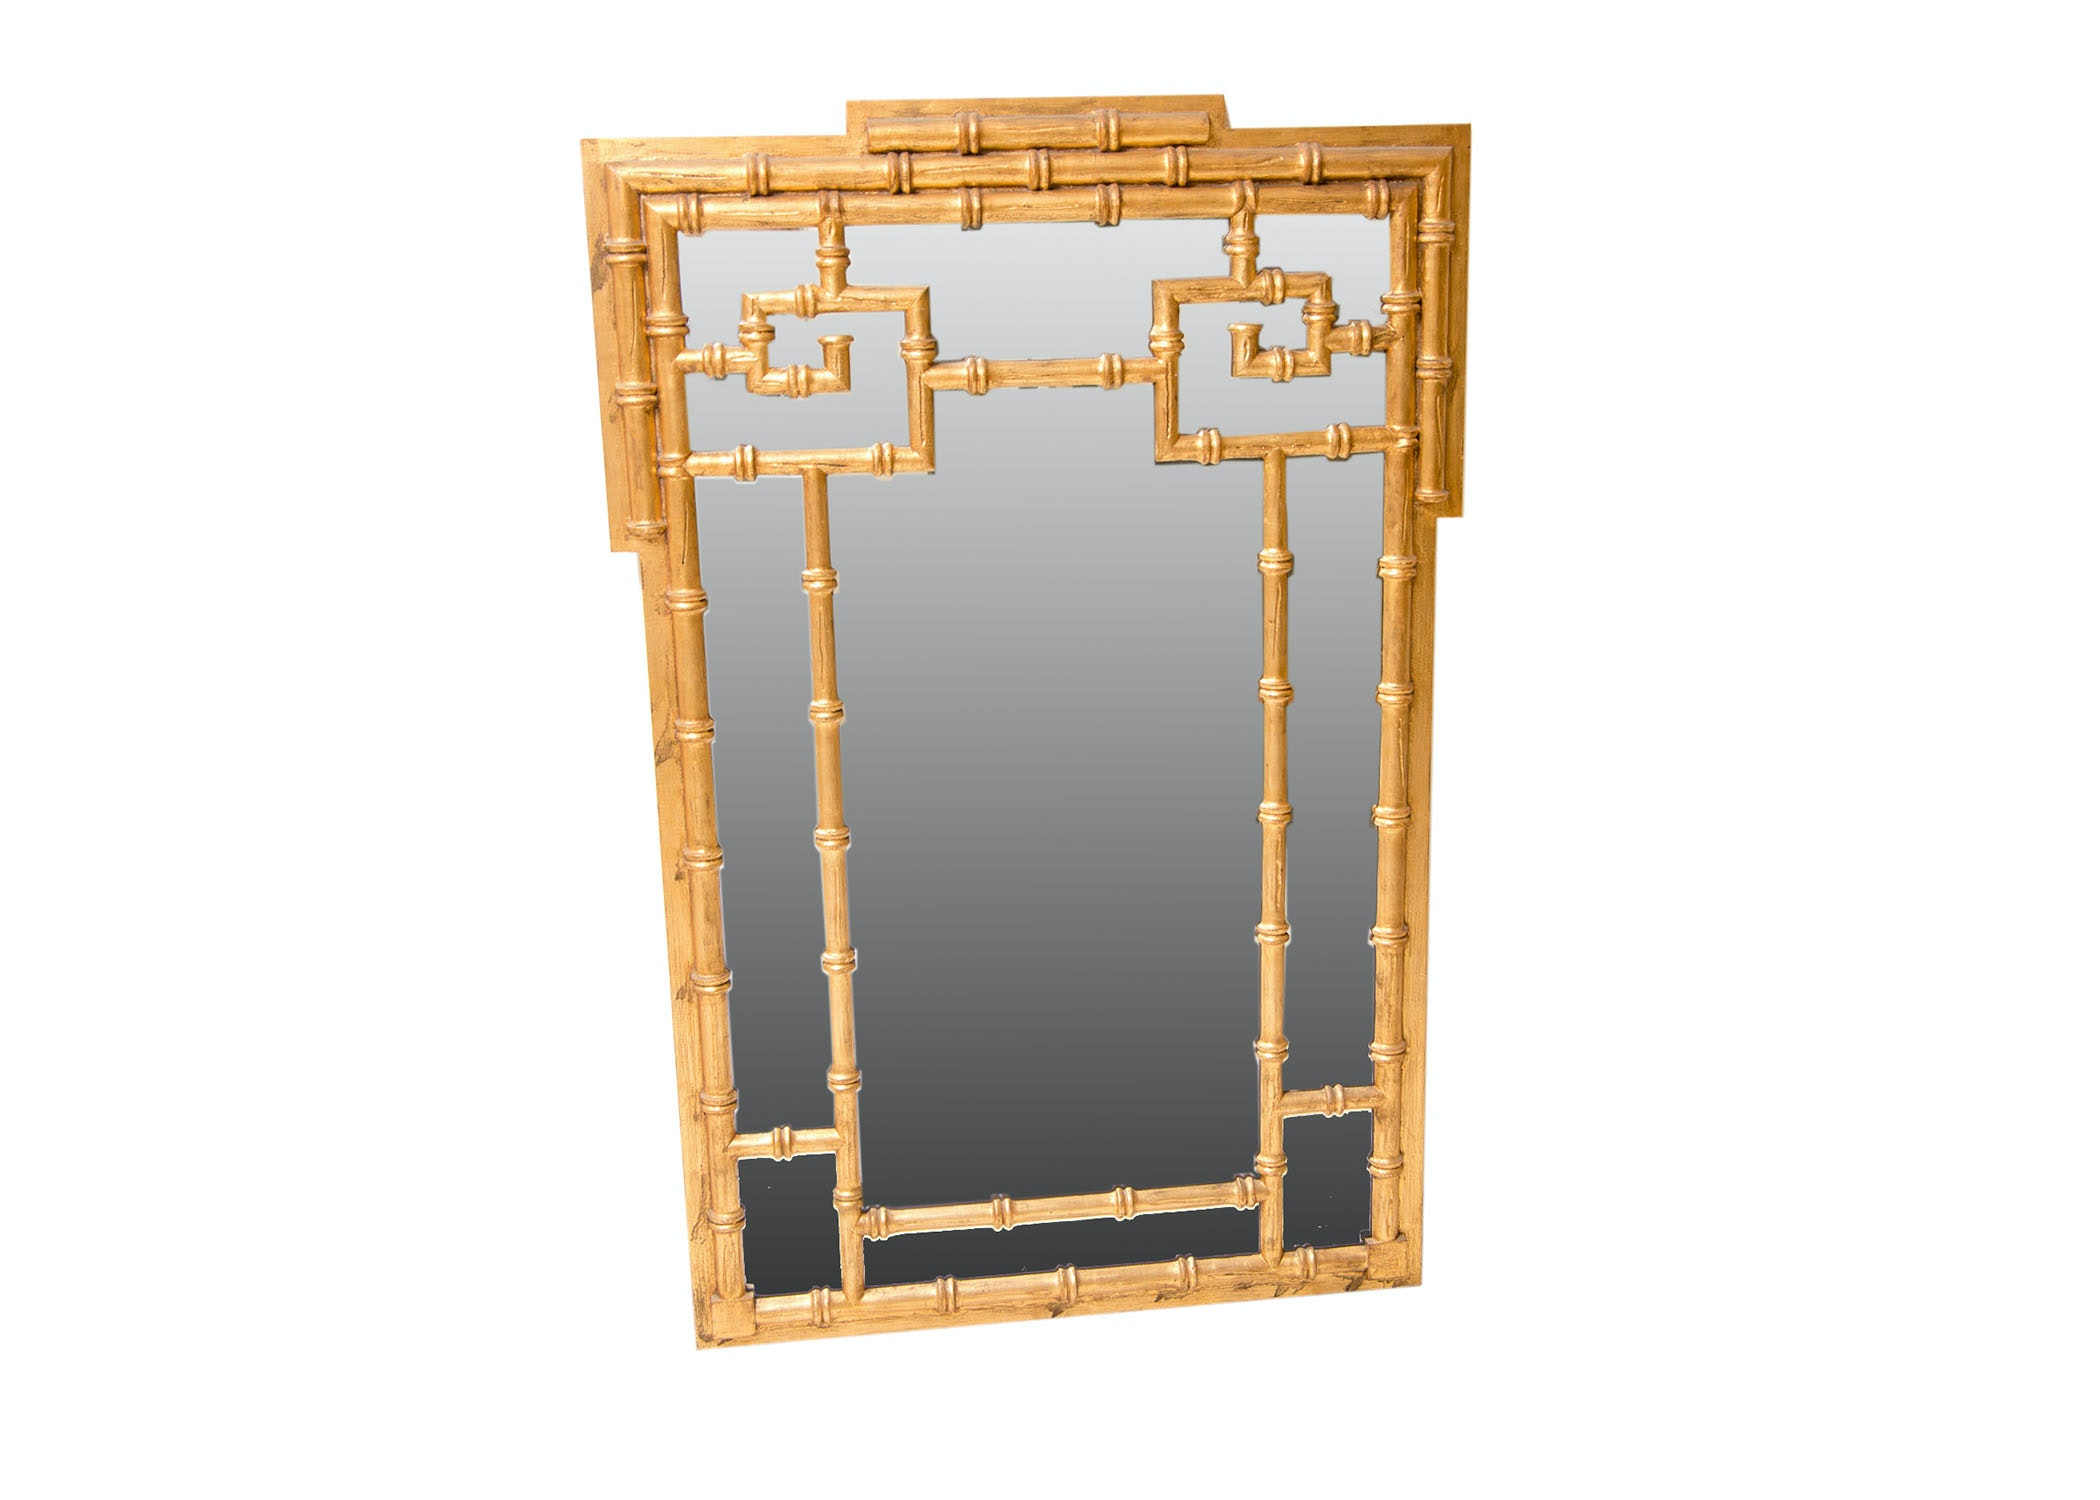 Bamboo Framed Wall Mirror